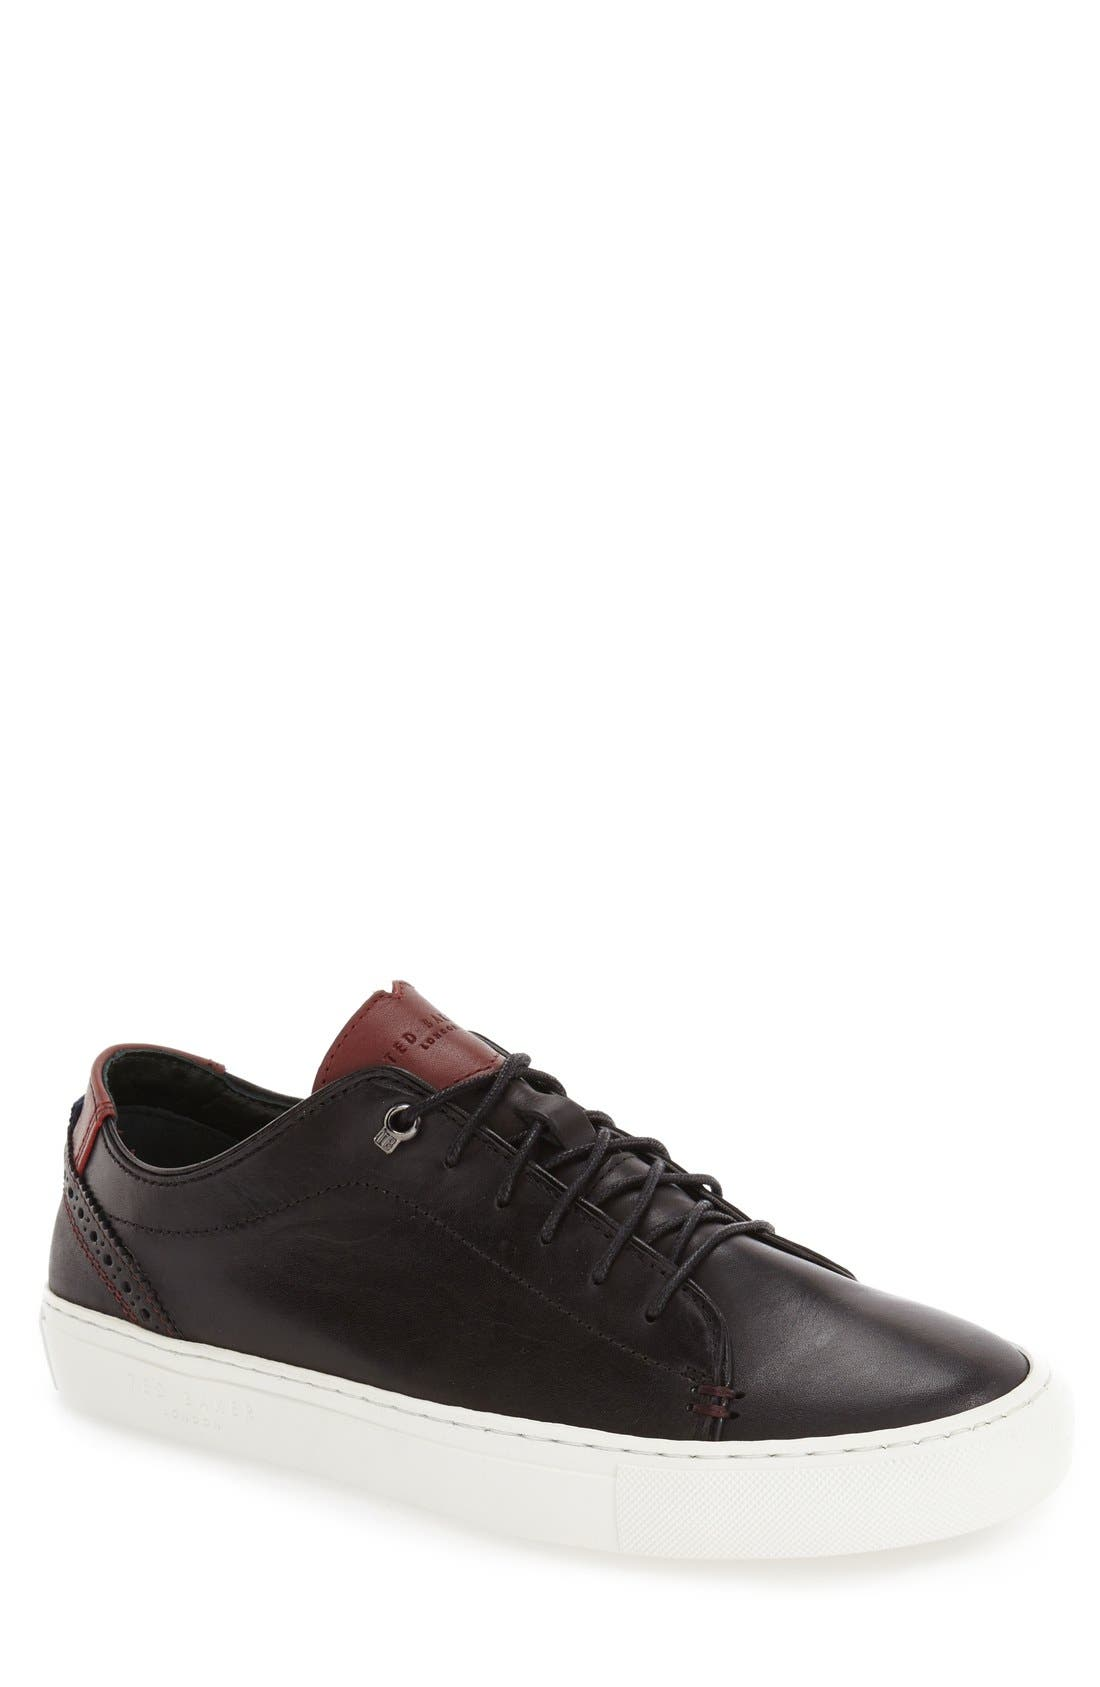 'Kiing Classic' Sneaker,                             Main thumbnail 1, color,